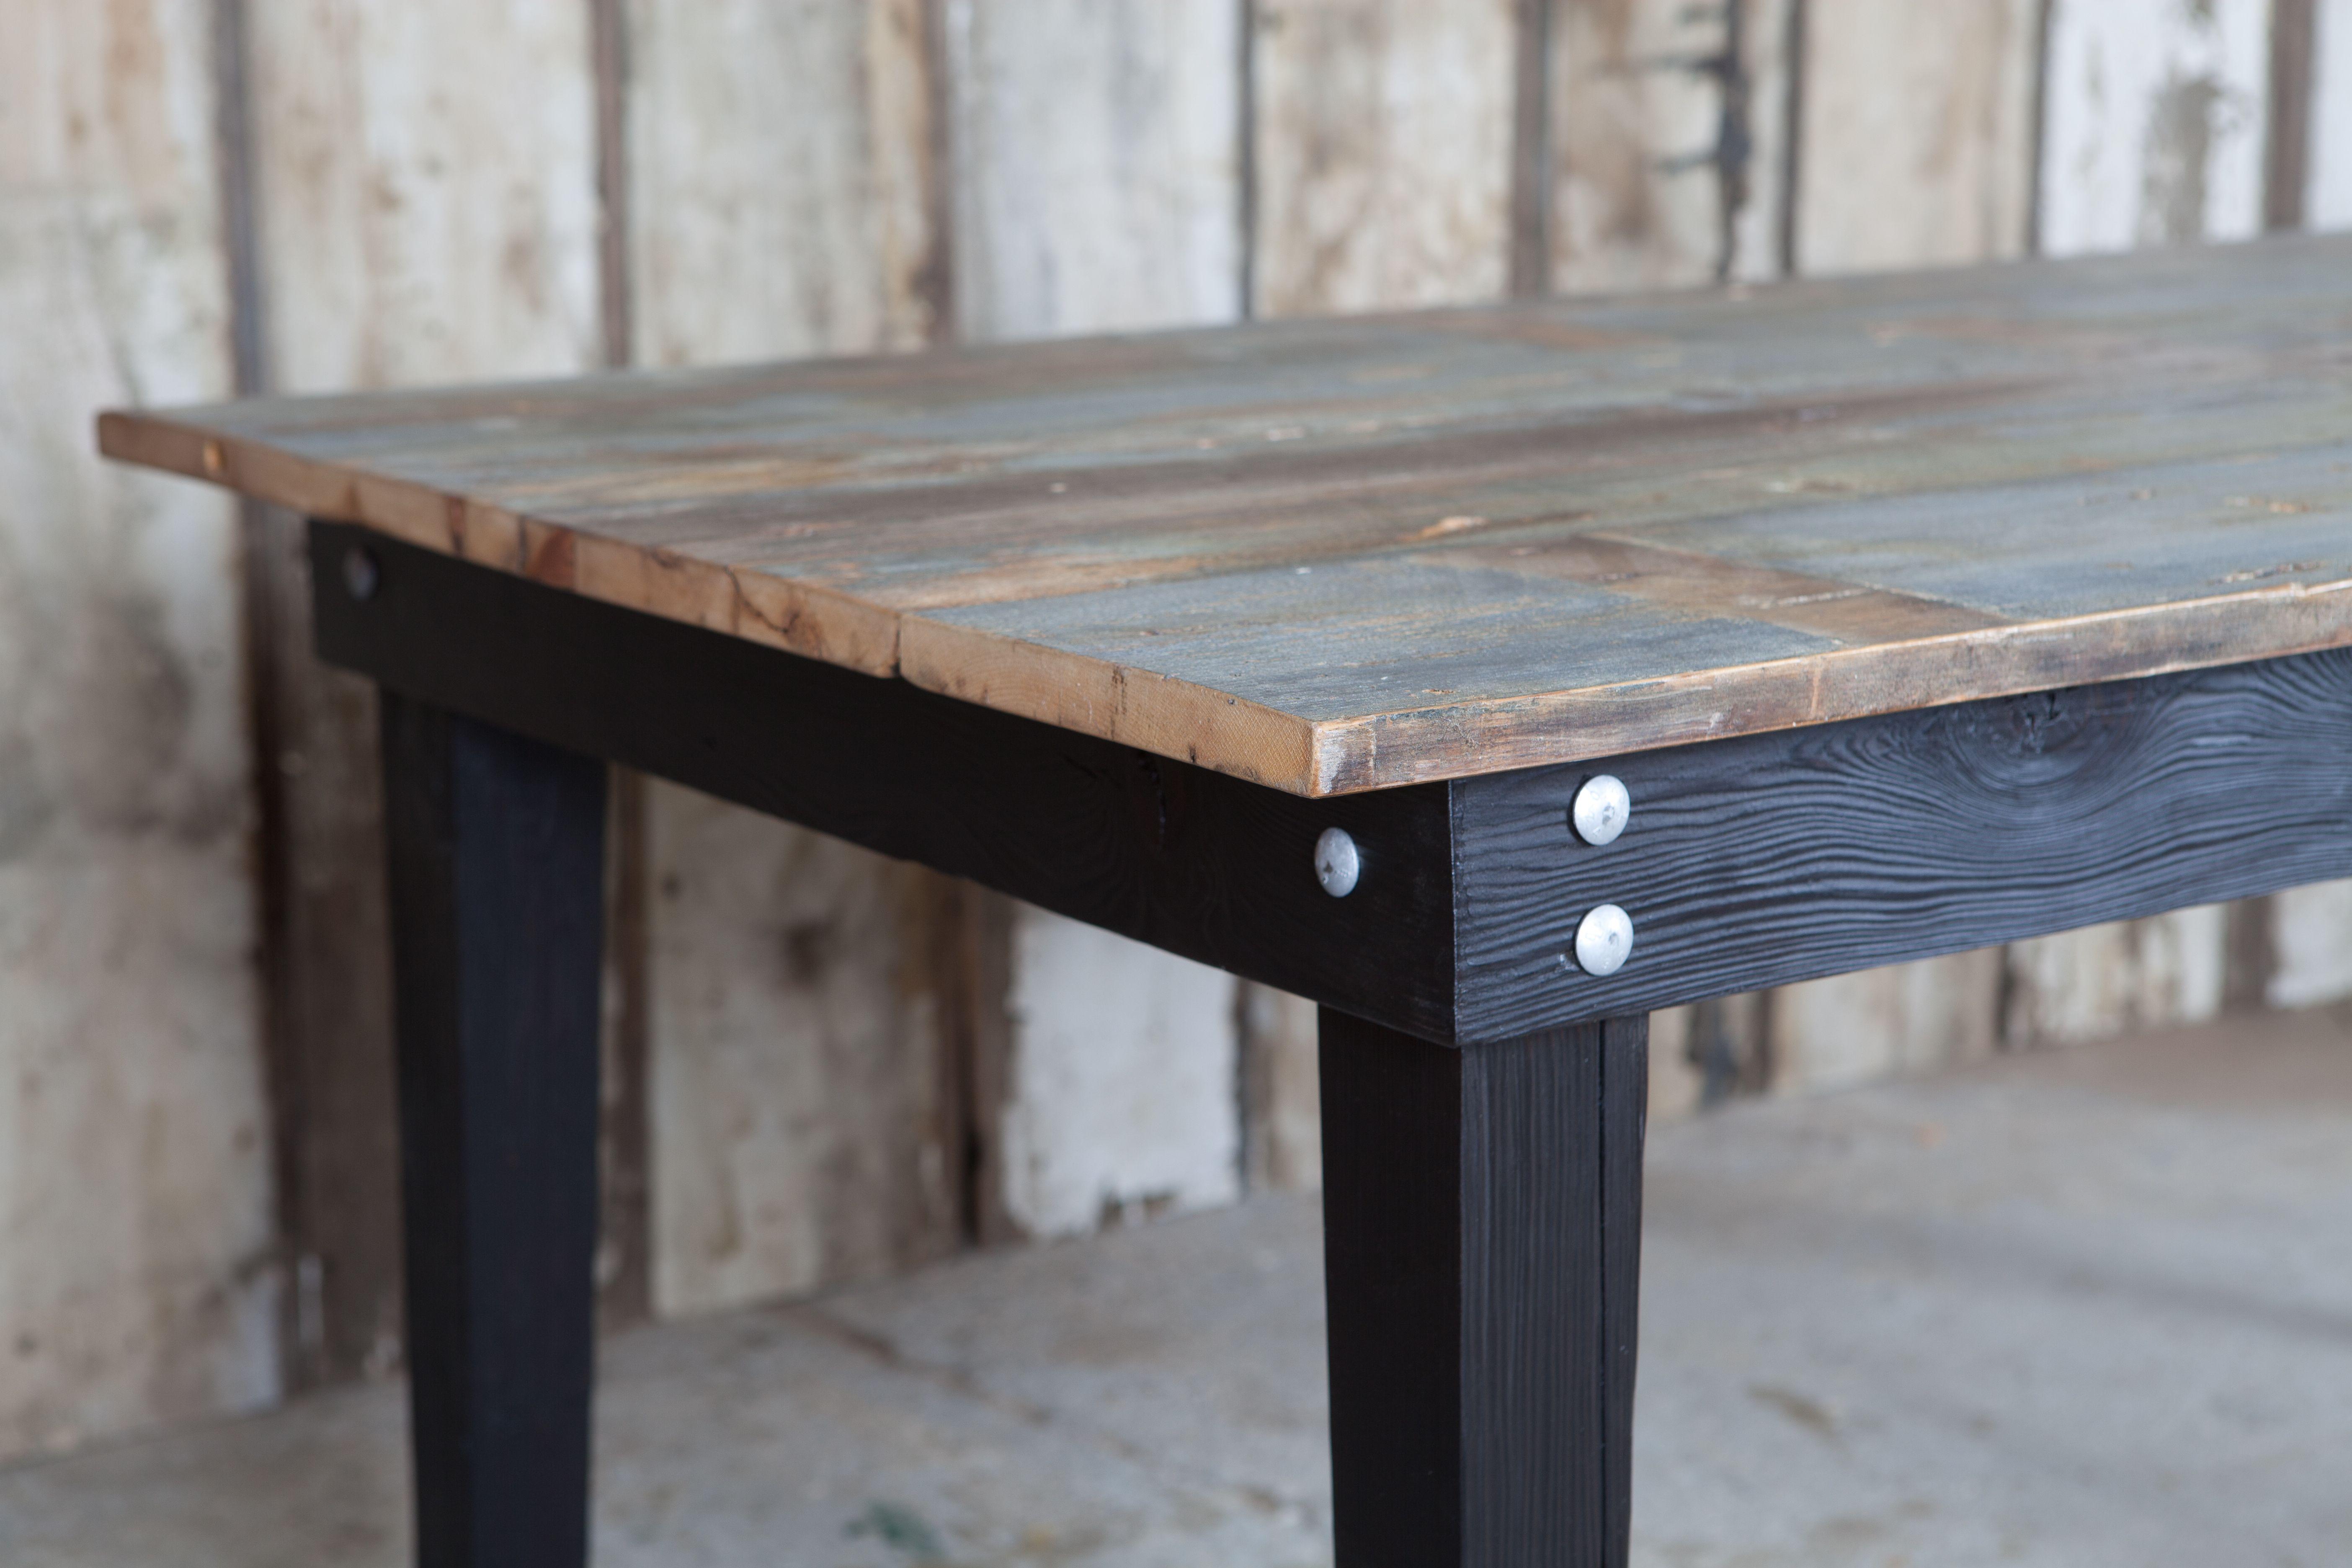 New Shou-sugi-ban Inspired Furniture From Materia Designs